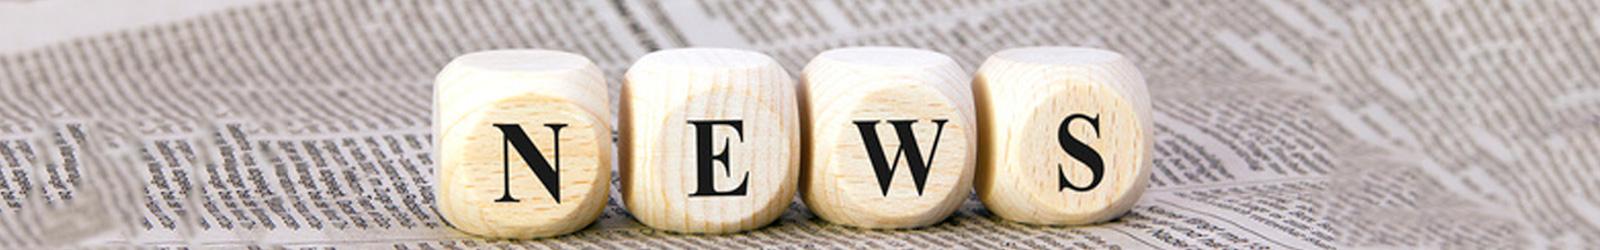 News compagny pd2i